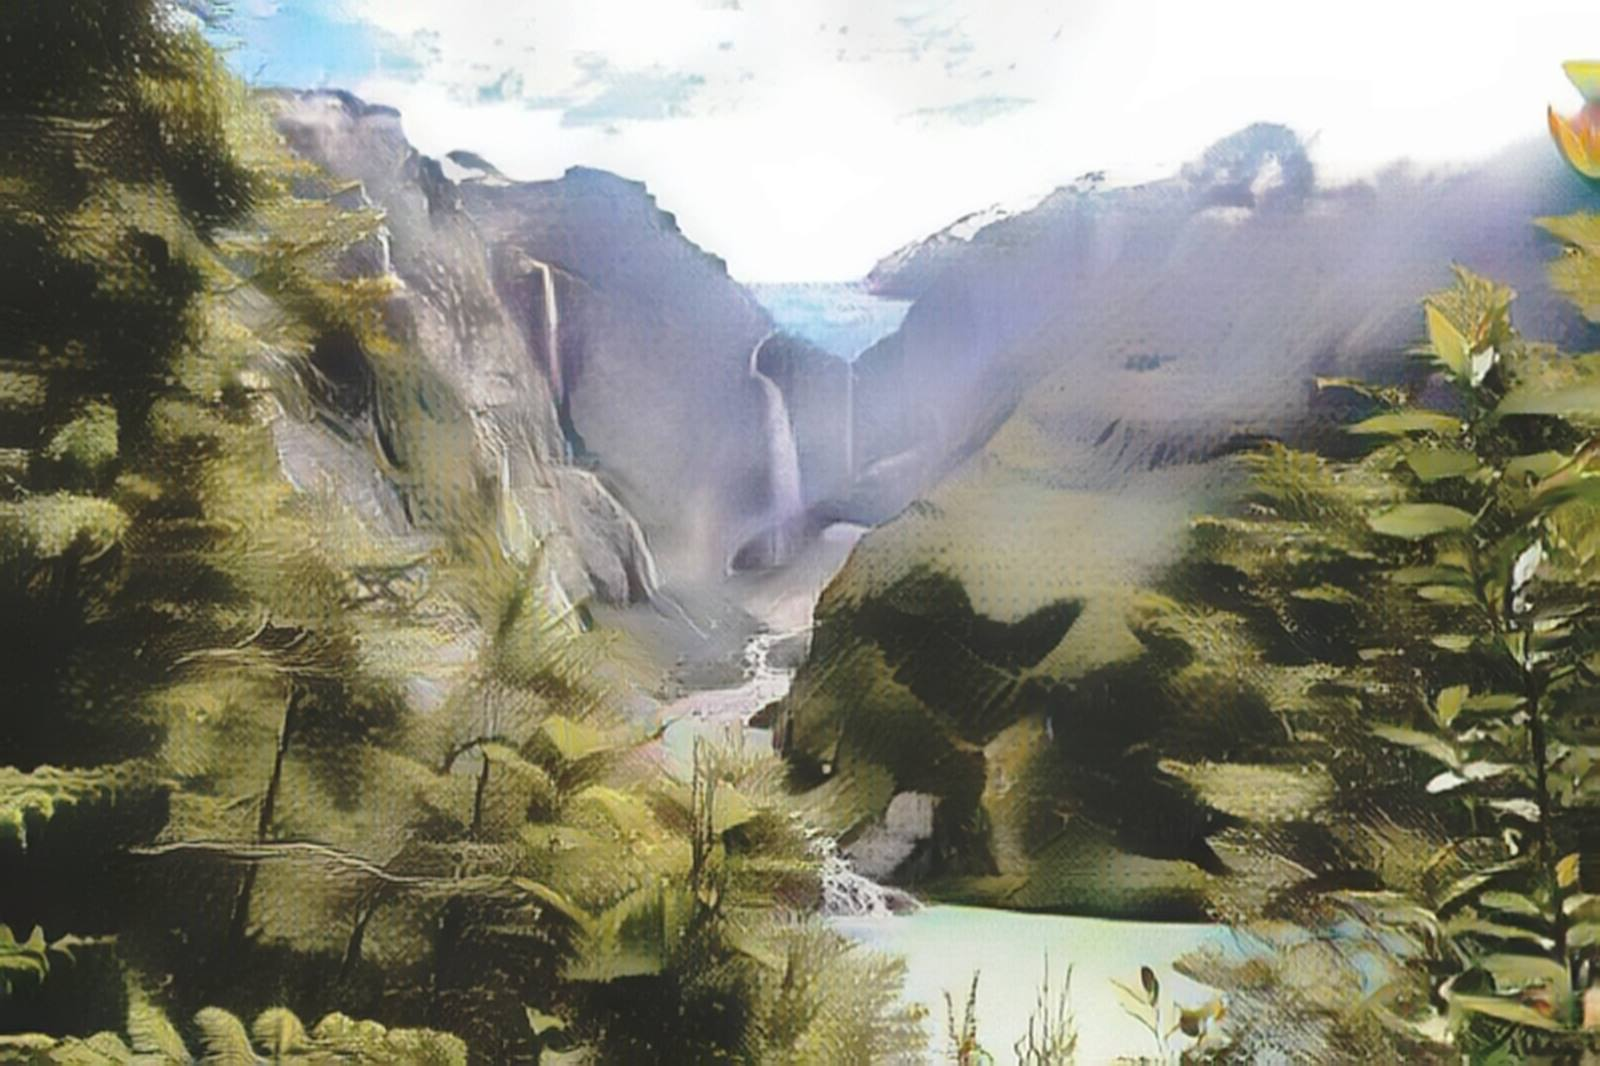 Puyuhuapi